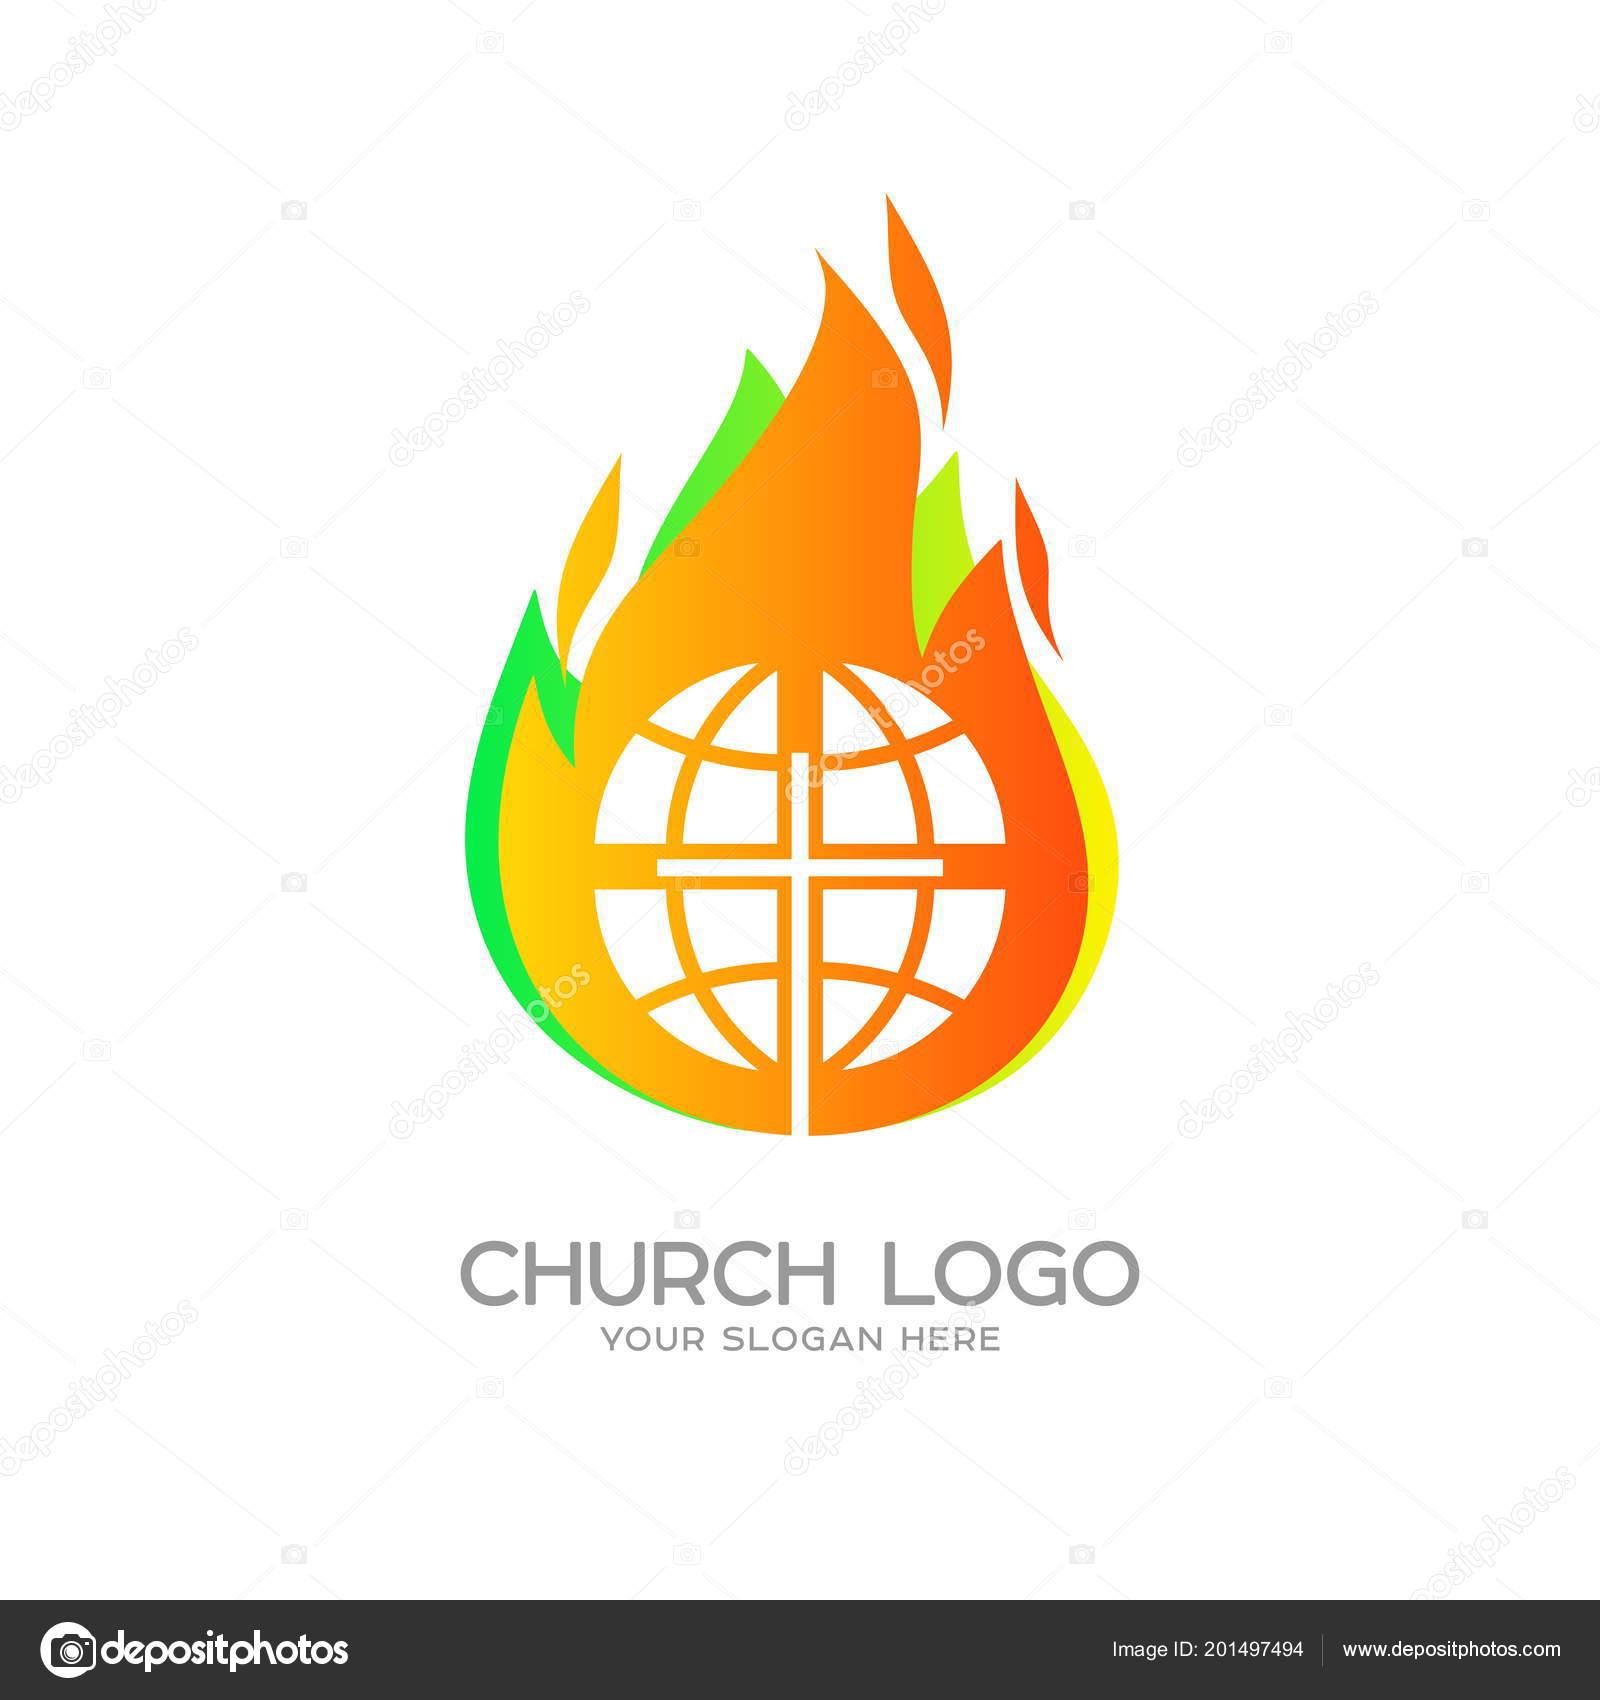 Church Logo Christian Symbols Globe Cross Jesus Christ Background